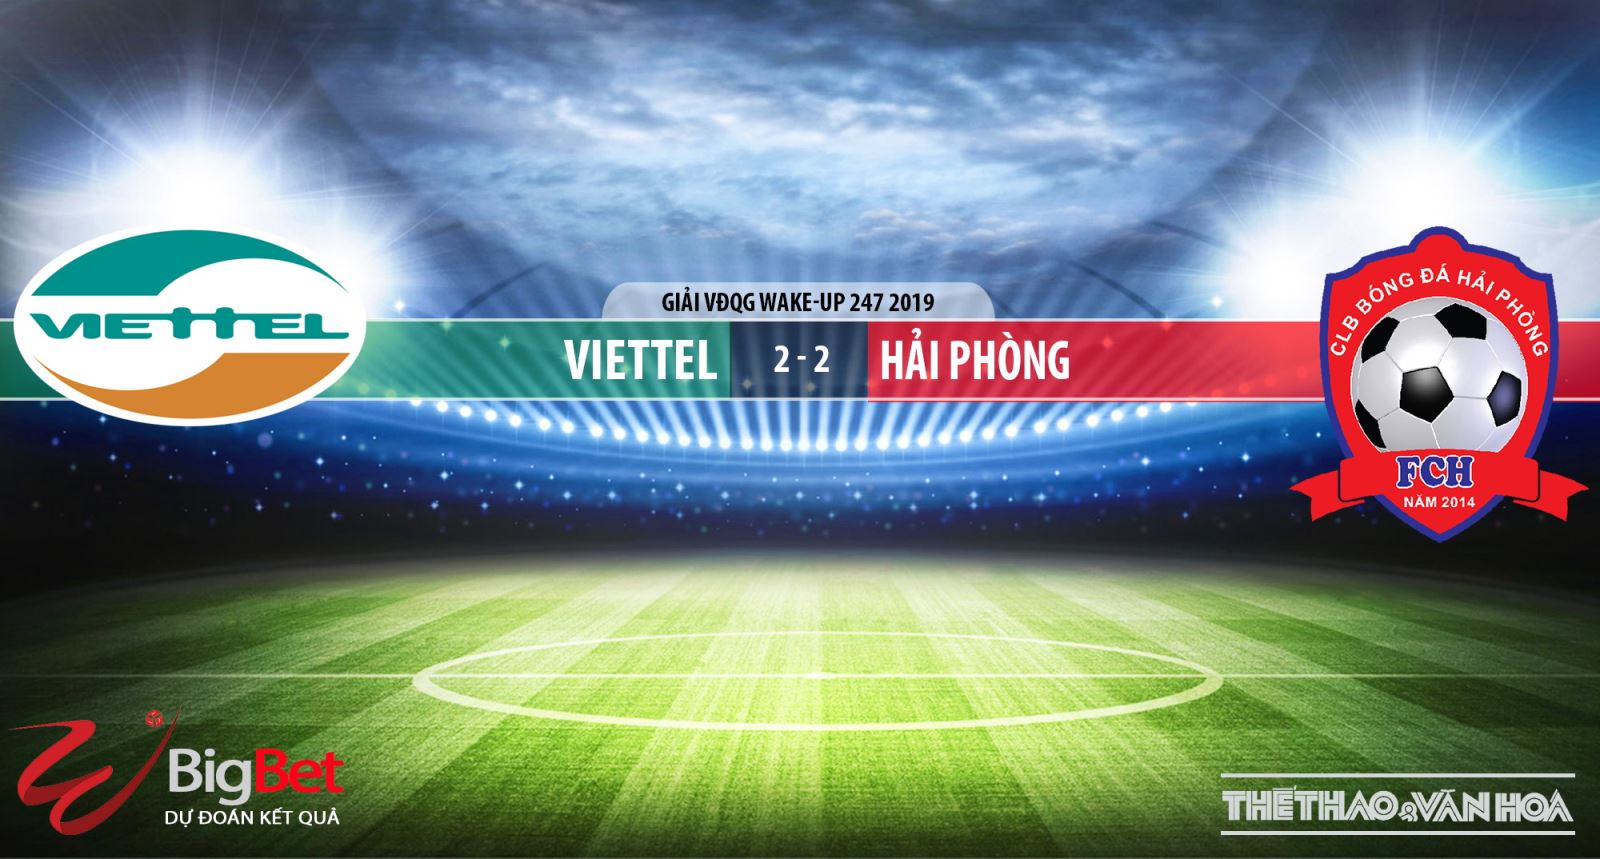 truc tiep bong da, Viettel vs Hải Phòng, trực tiếp bóng đá, truc tiep Viettel vs Hải Phòng, Viettel, Hải Phòng, V League 2019, truc tiep V League